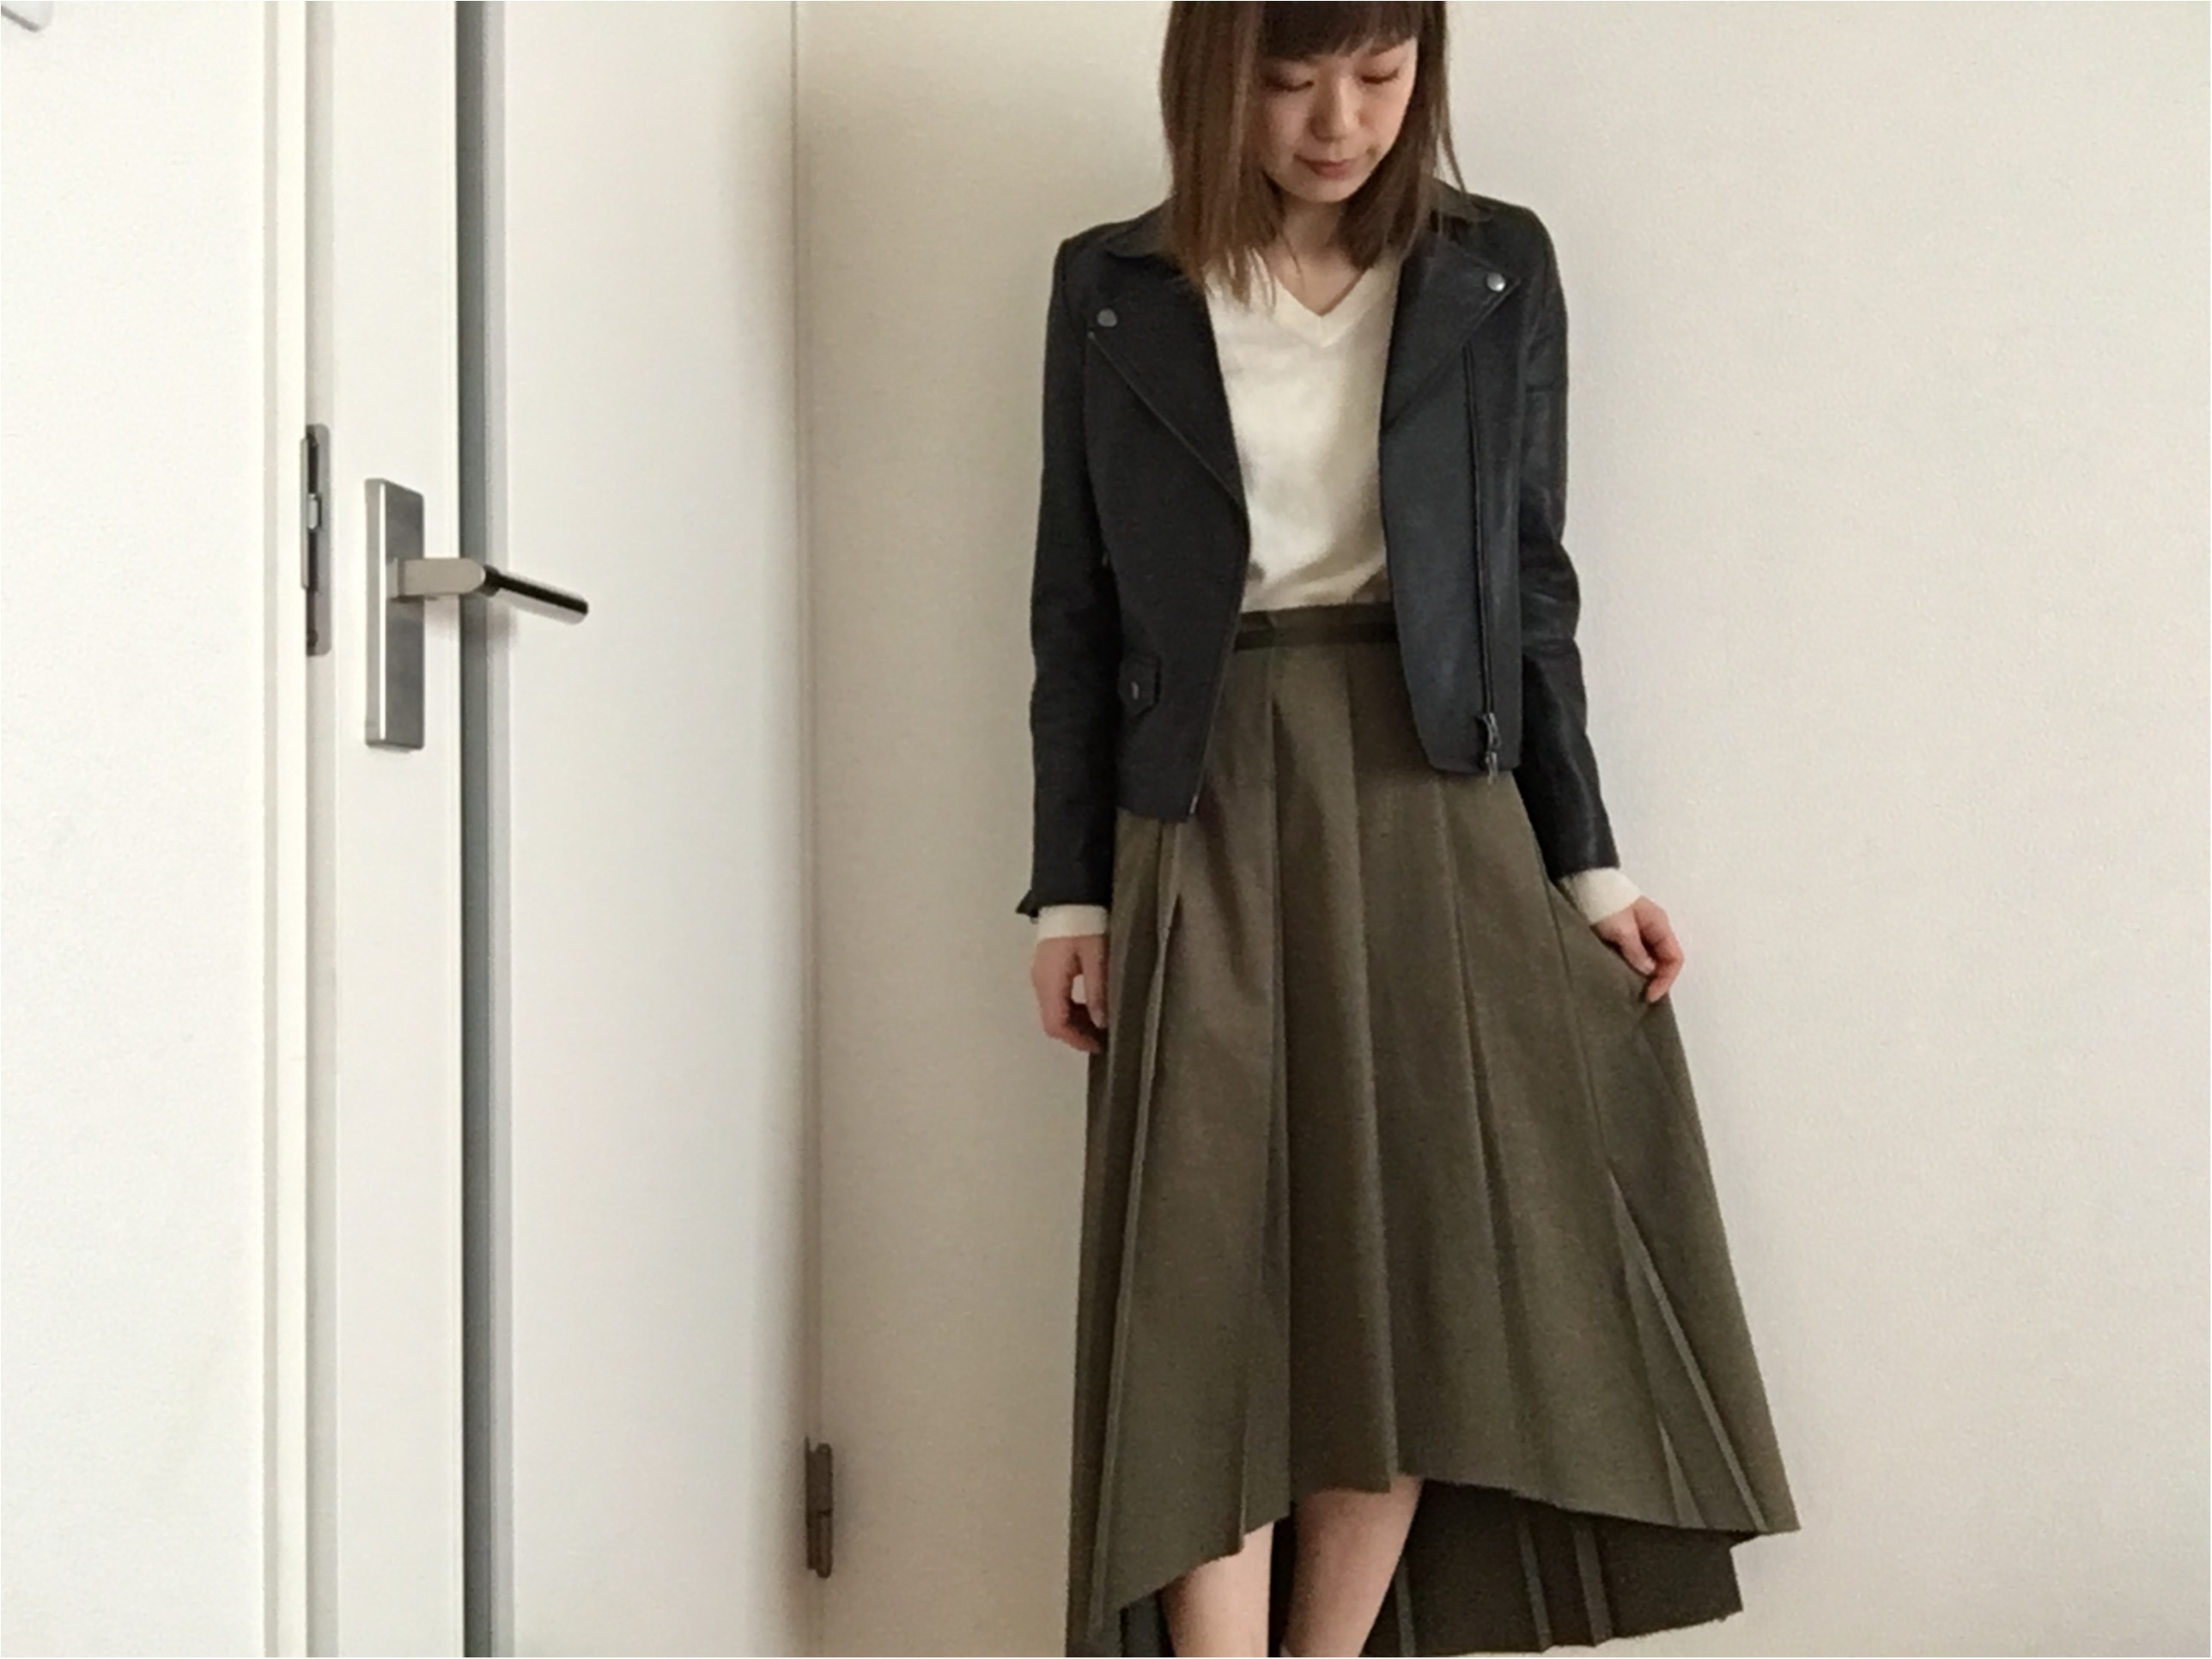 ★【ayachille code】7days fashion show!7days☺︎_7